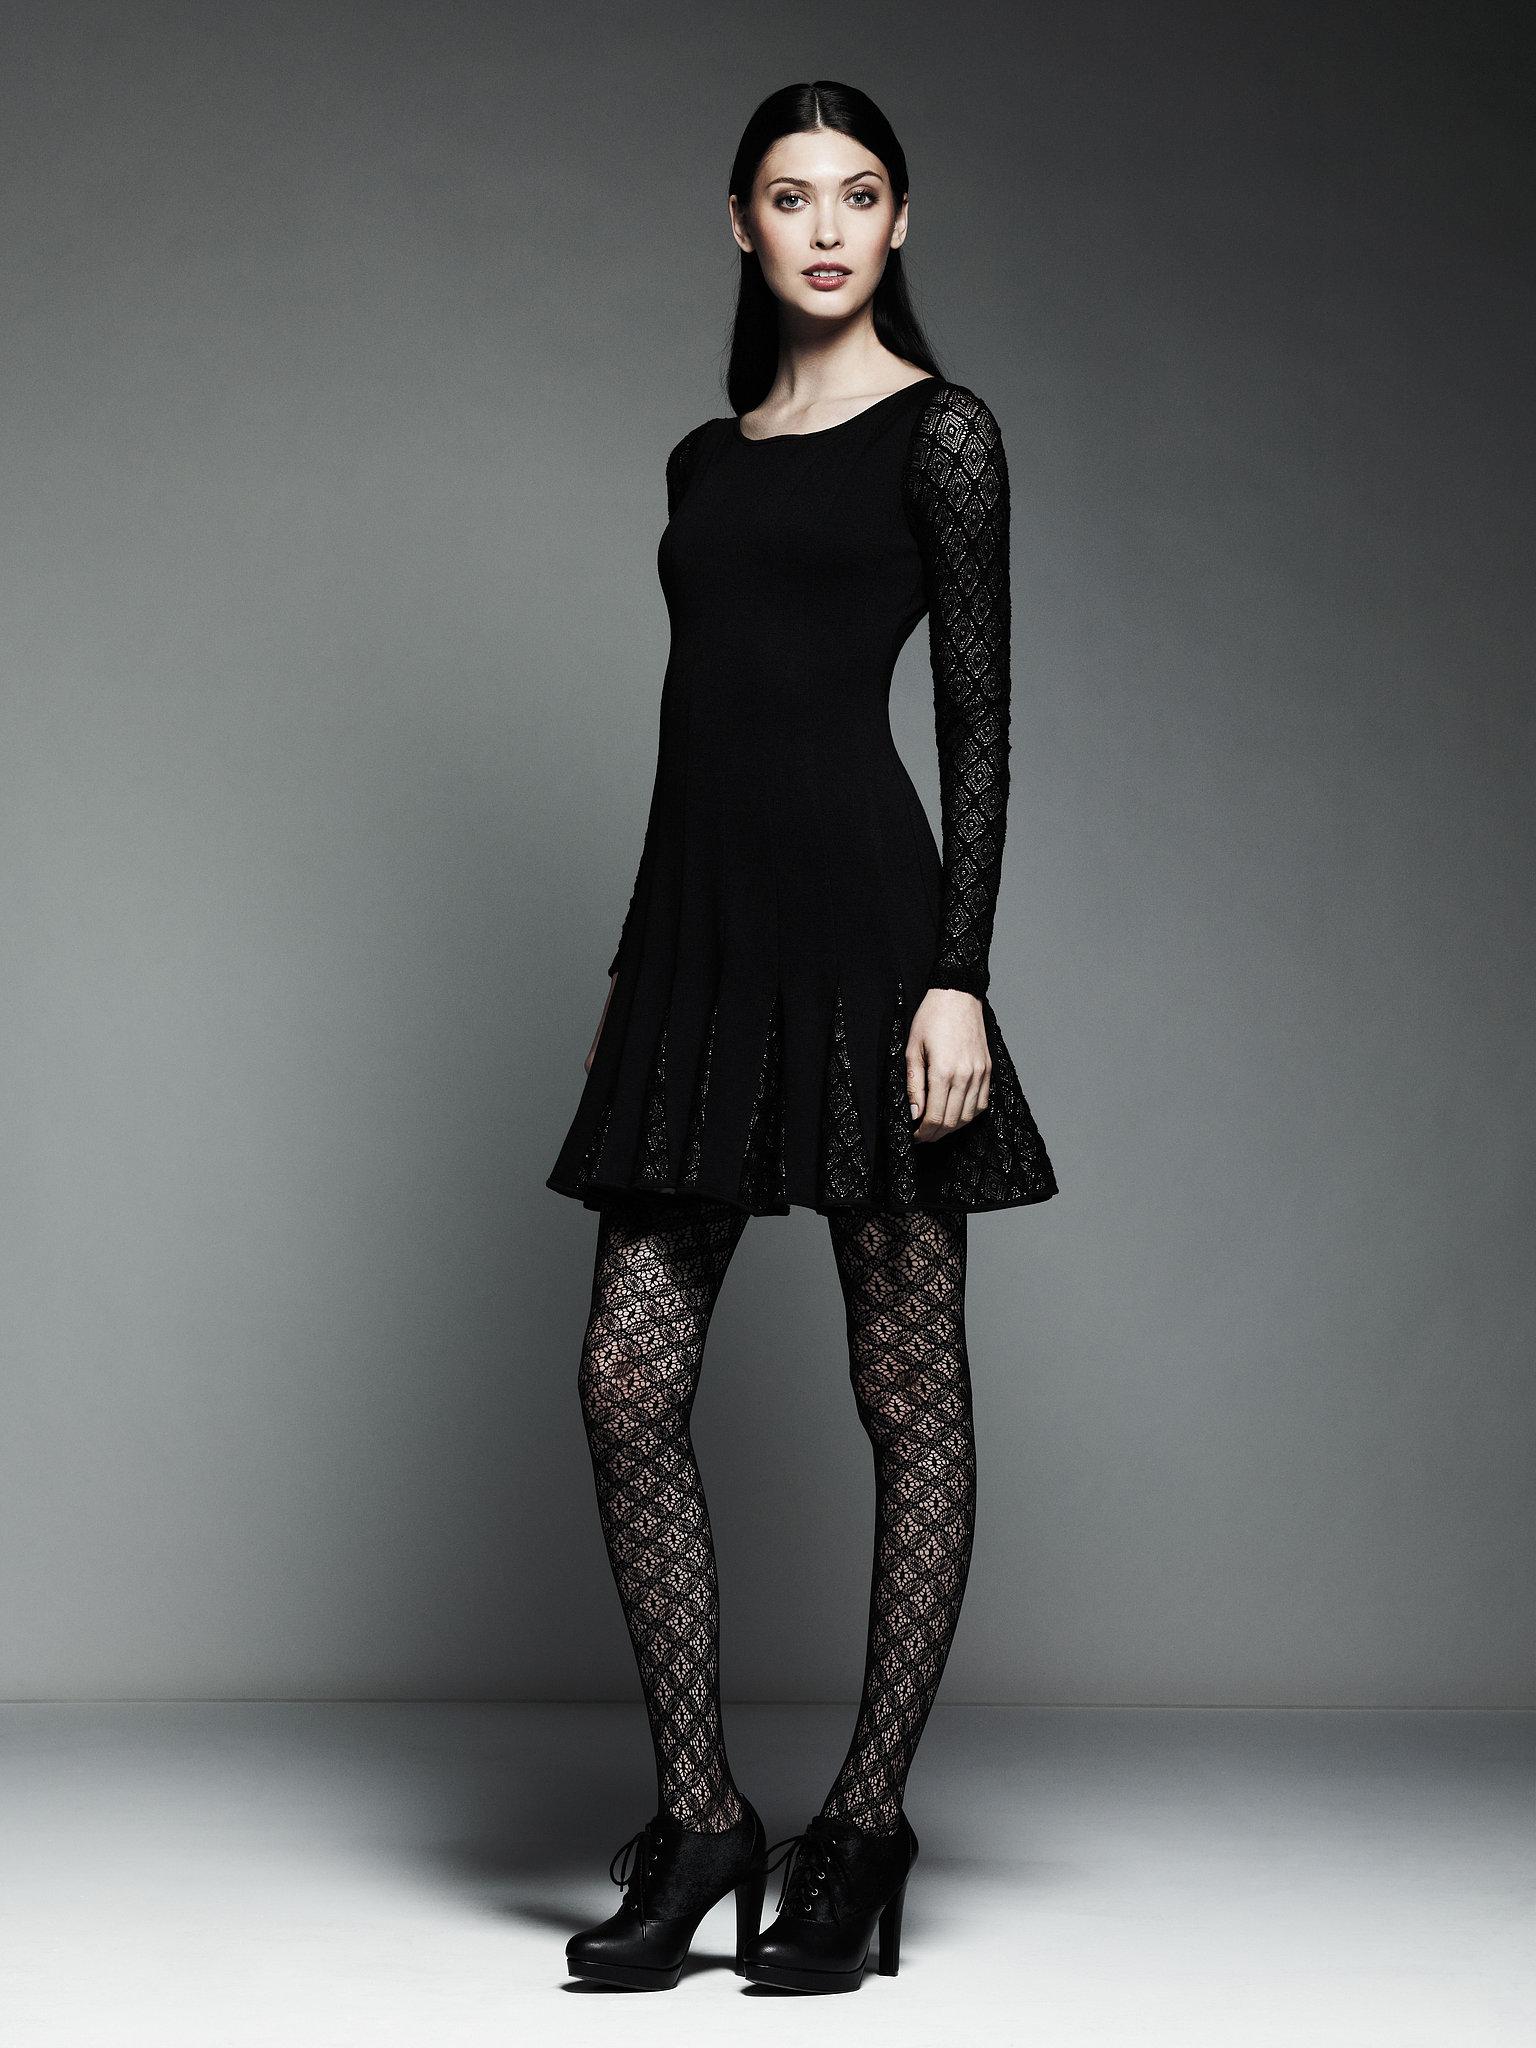 Lace Gore Dress ($78) Photo courtesy of Kohl's